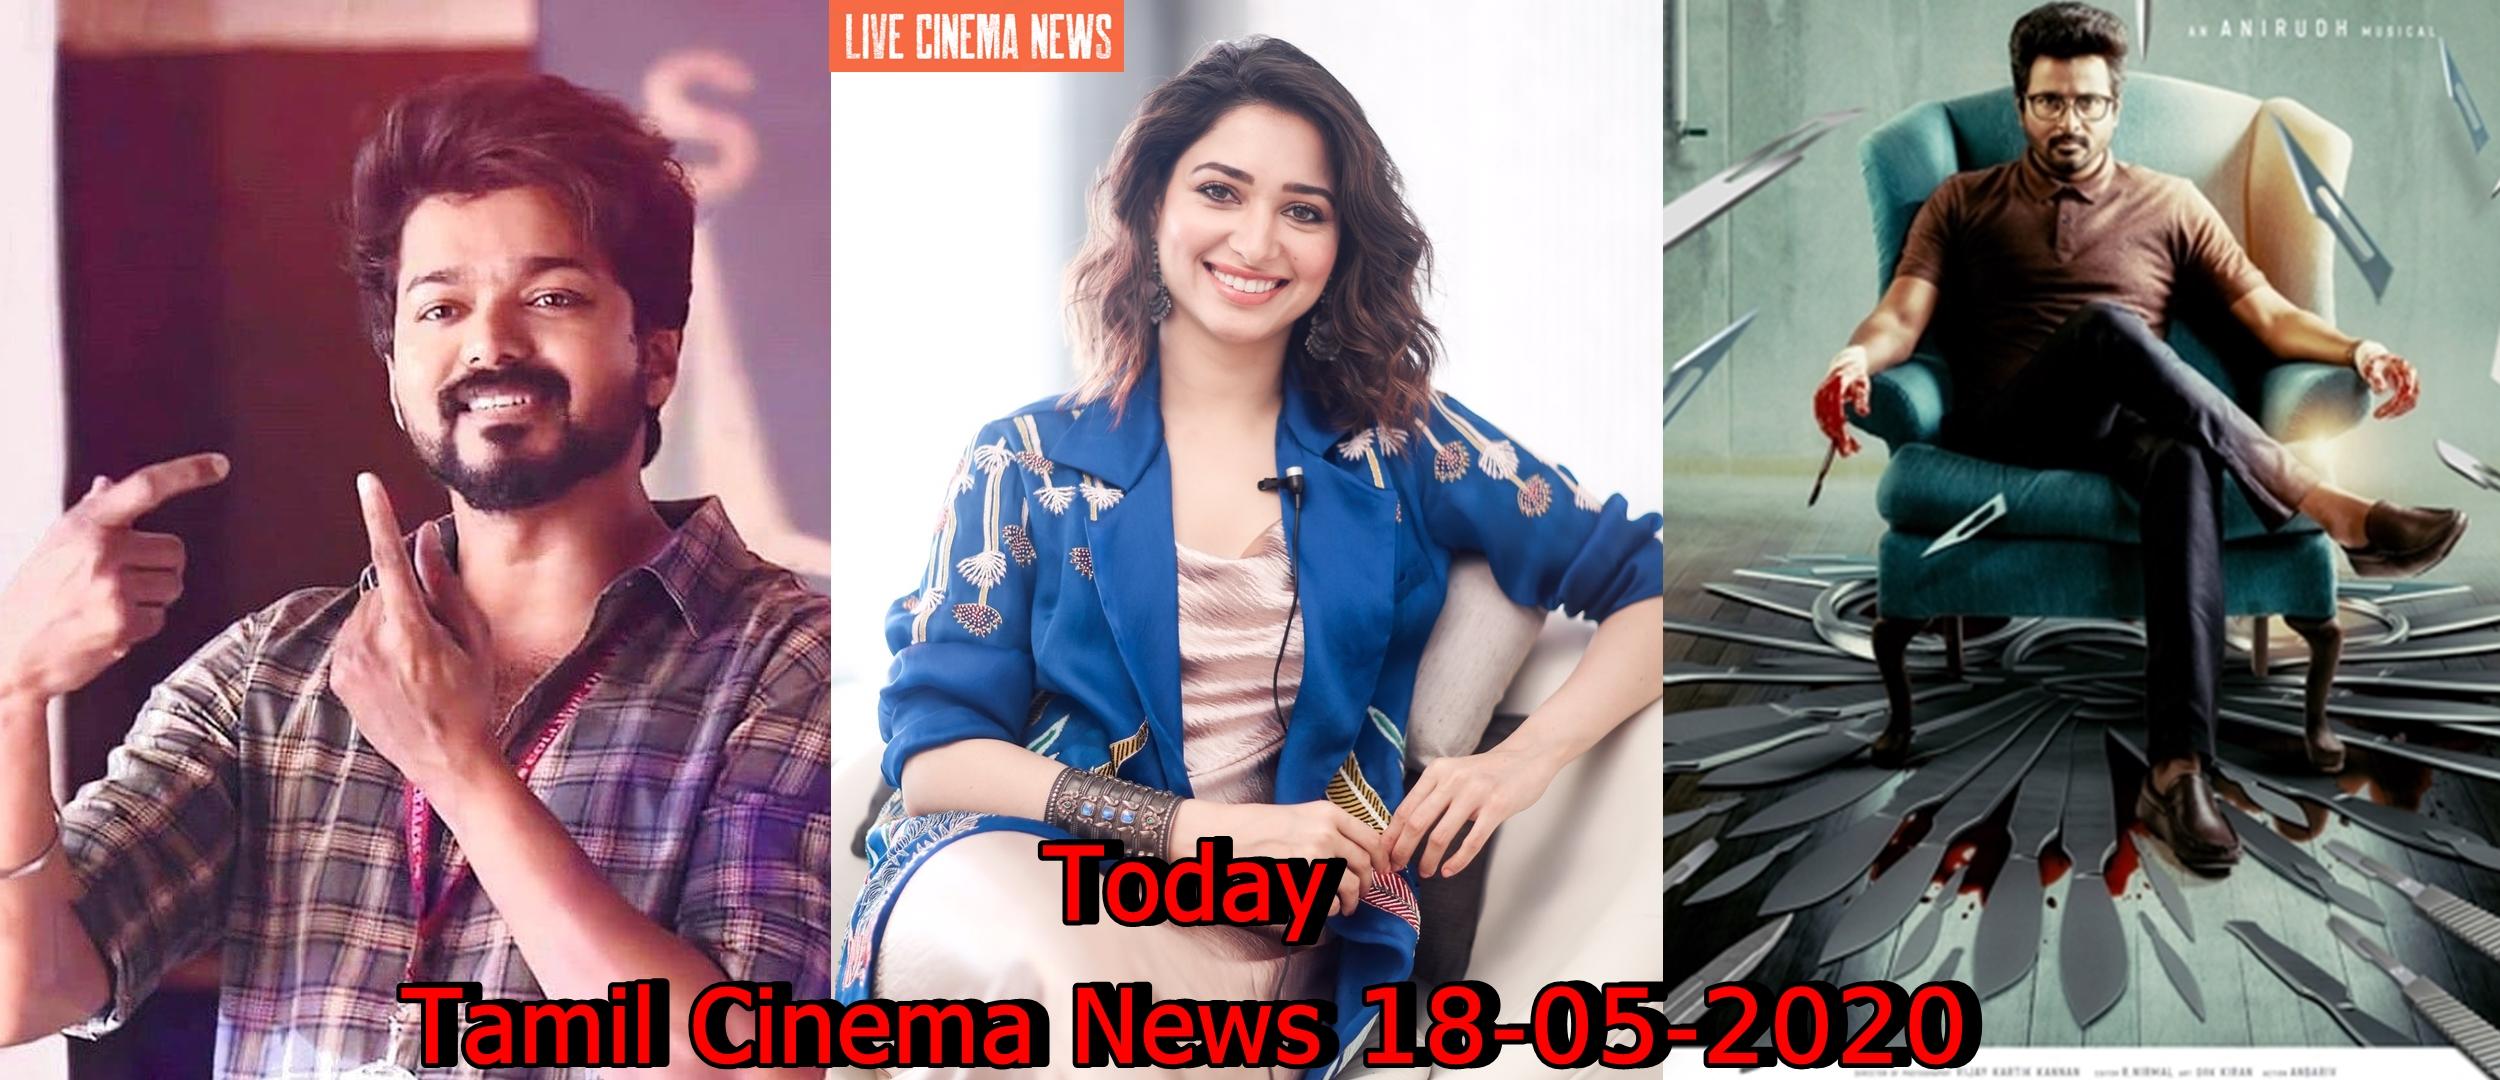 Today Tamil Cinema News 18-05-2020